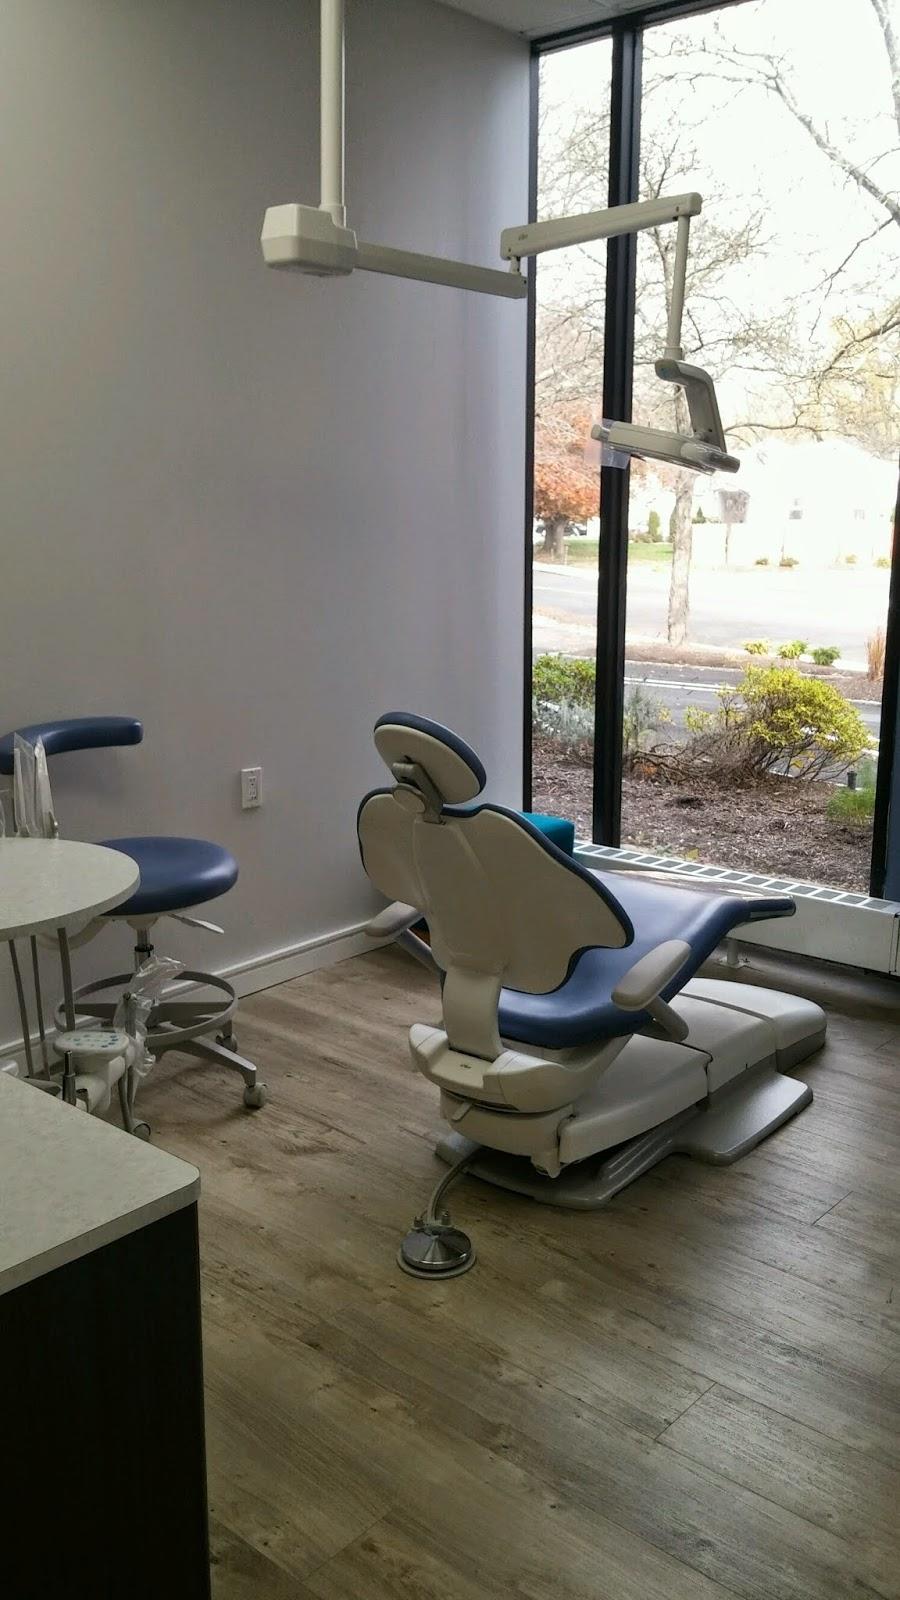 Precious Pearls Pediatric Dentistry - dentist  | Photo 2 of 10 | Address: 140 Mountain Ave #102, Springfield, NJ 07081, USA | Phone: (973) 232-5448